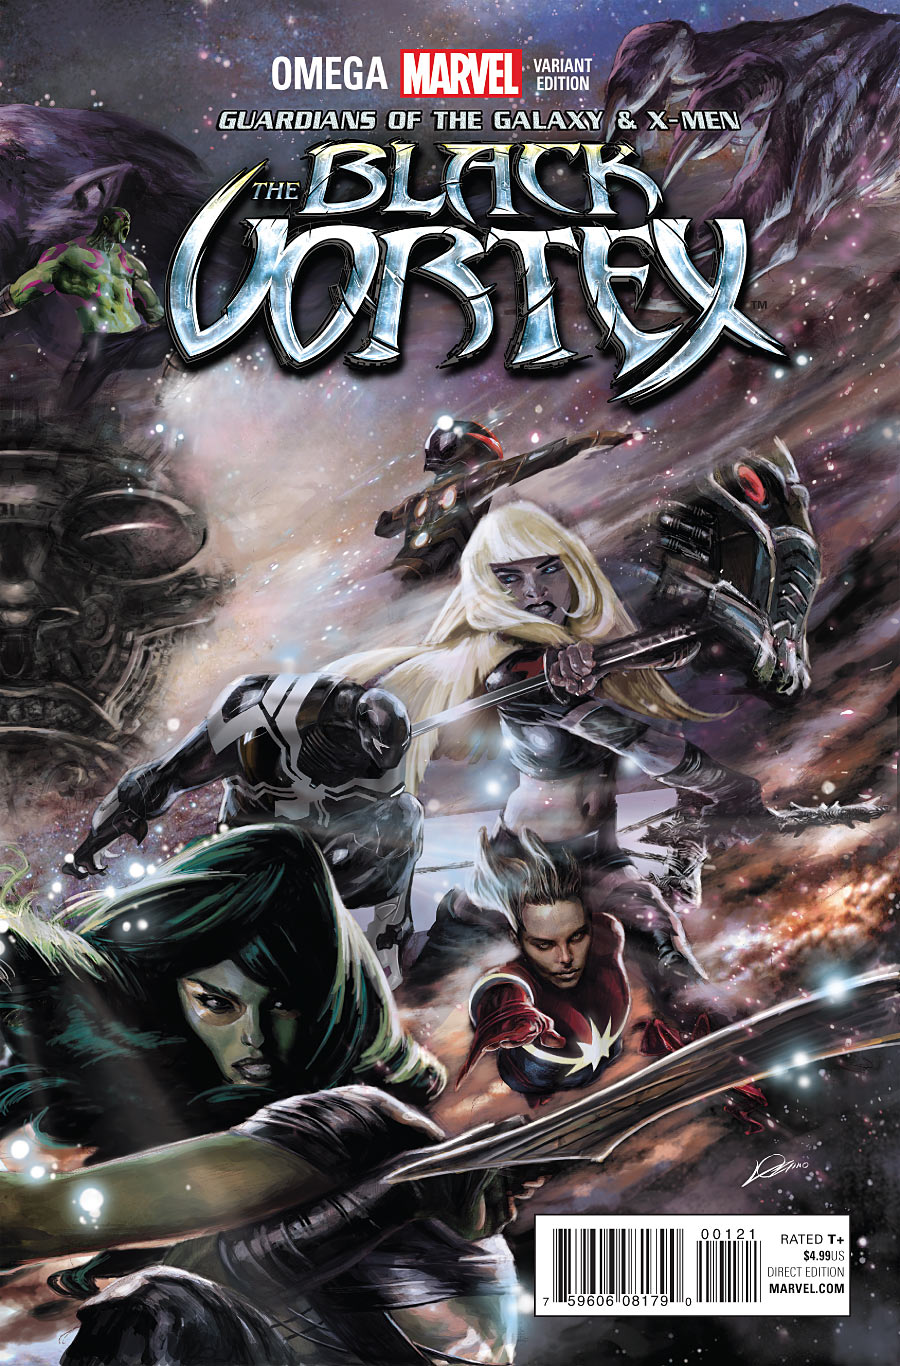 Guardians of the Galaxy & X-Men Black Vortex Omega Vol 1 1 Lozano Variant.jpg